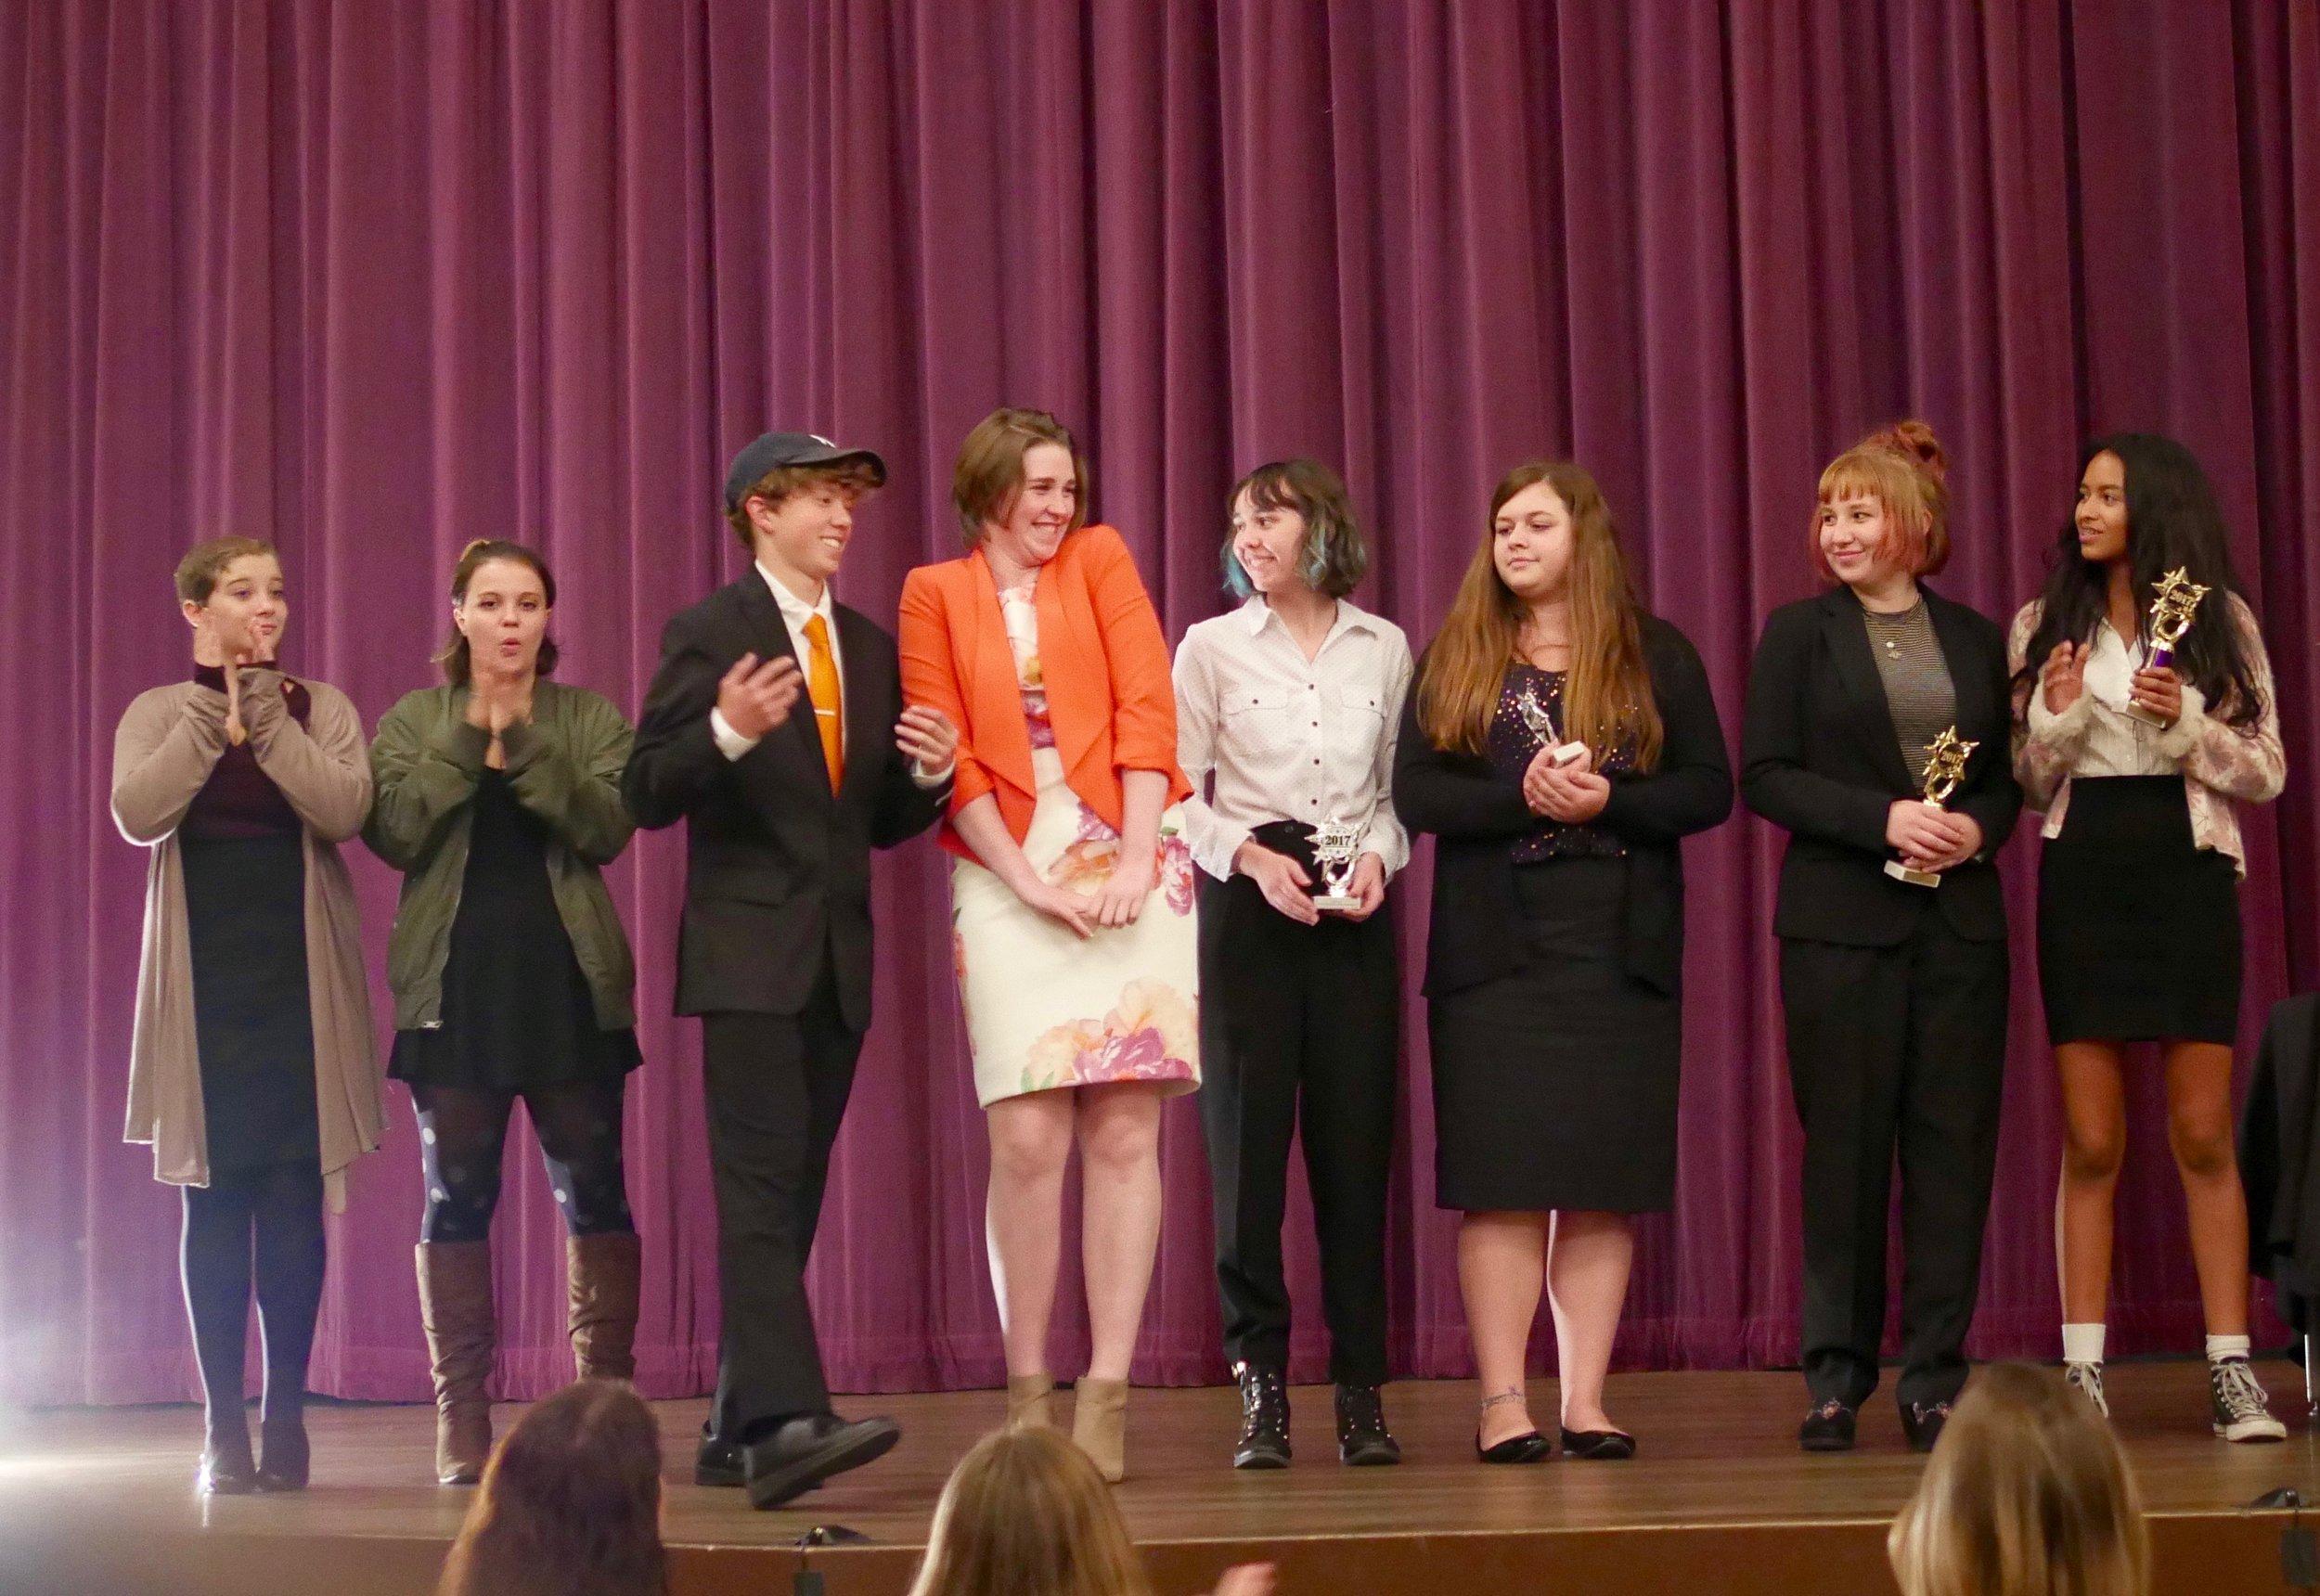 (from left) Kylah Ward, Jade Loev, Grant Lulich, Gabi Taylor, Hailey Carroll, Amelia Kahn, Claire Glassford, and Jasmine Yanez receive novice parli awards